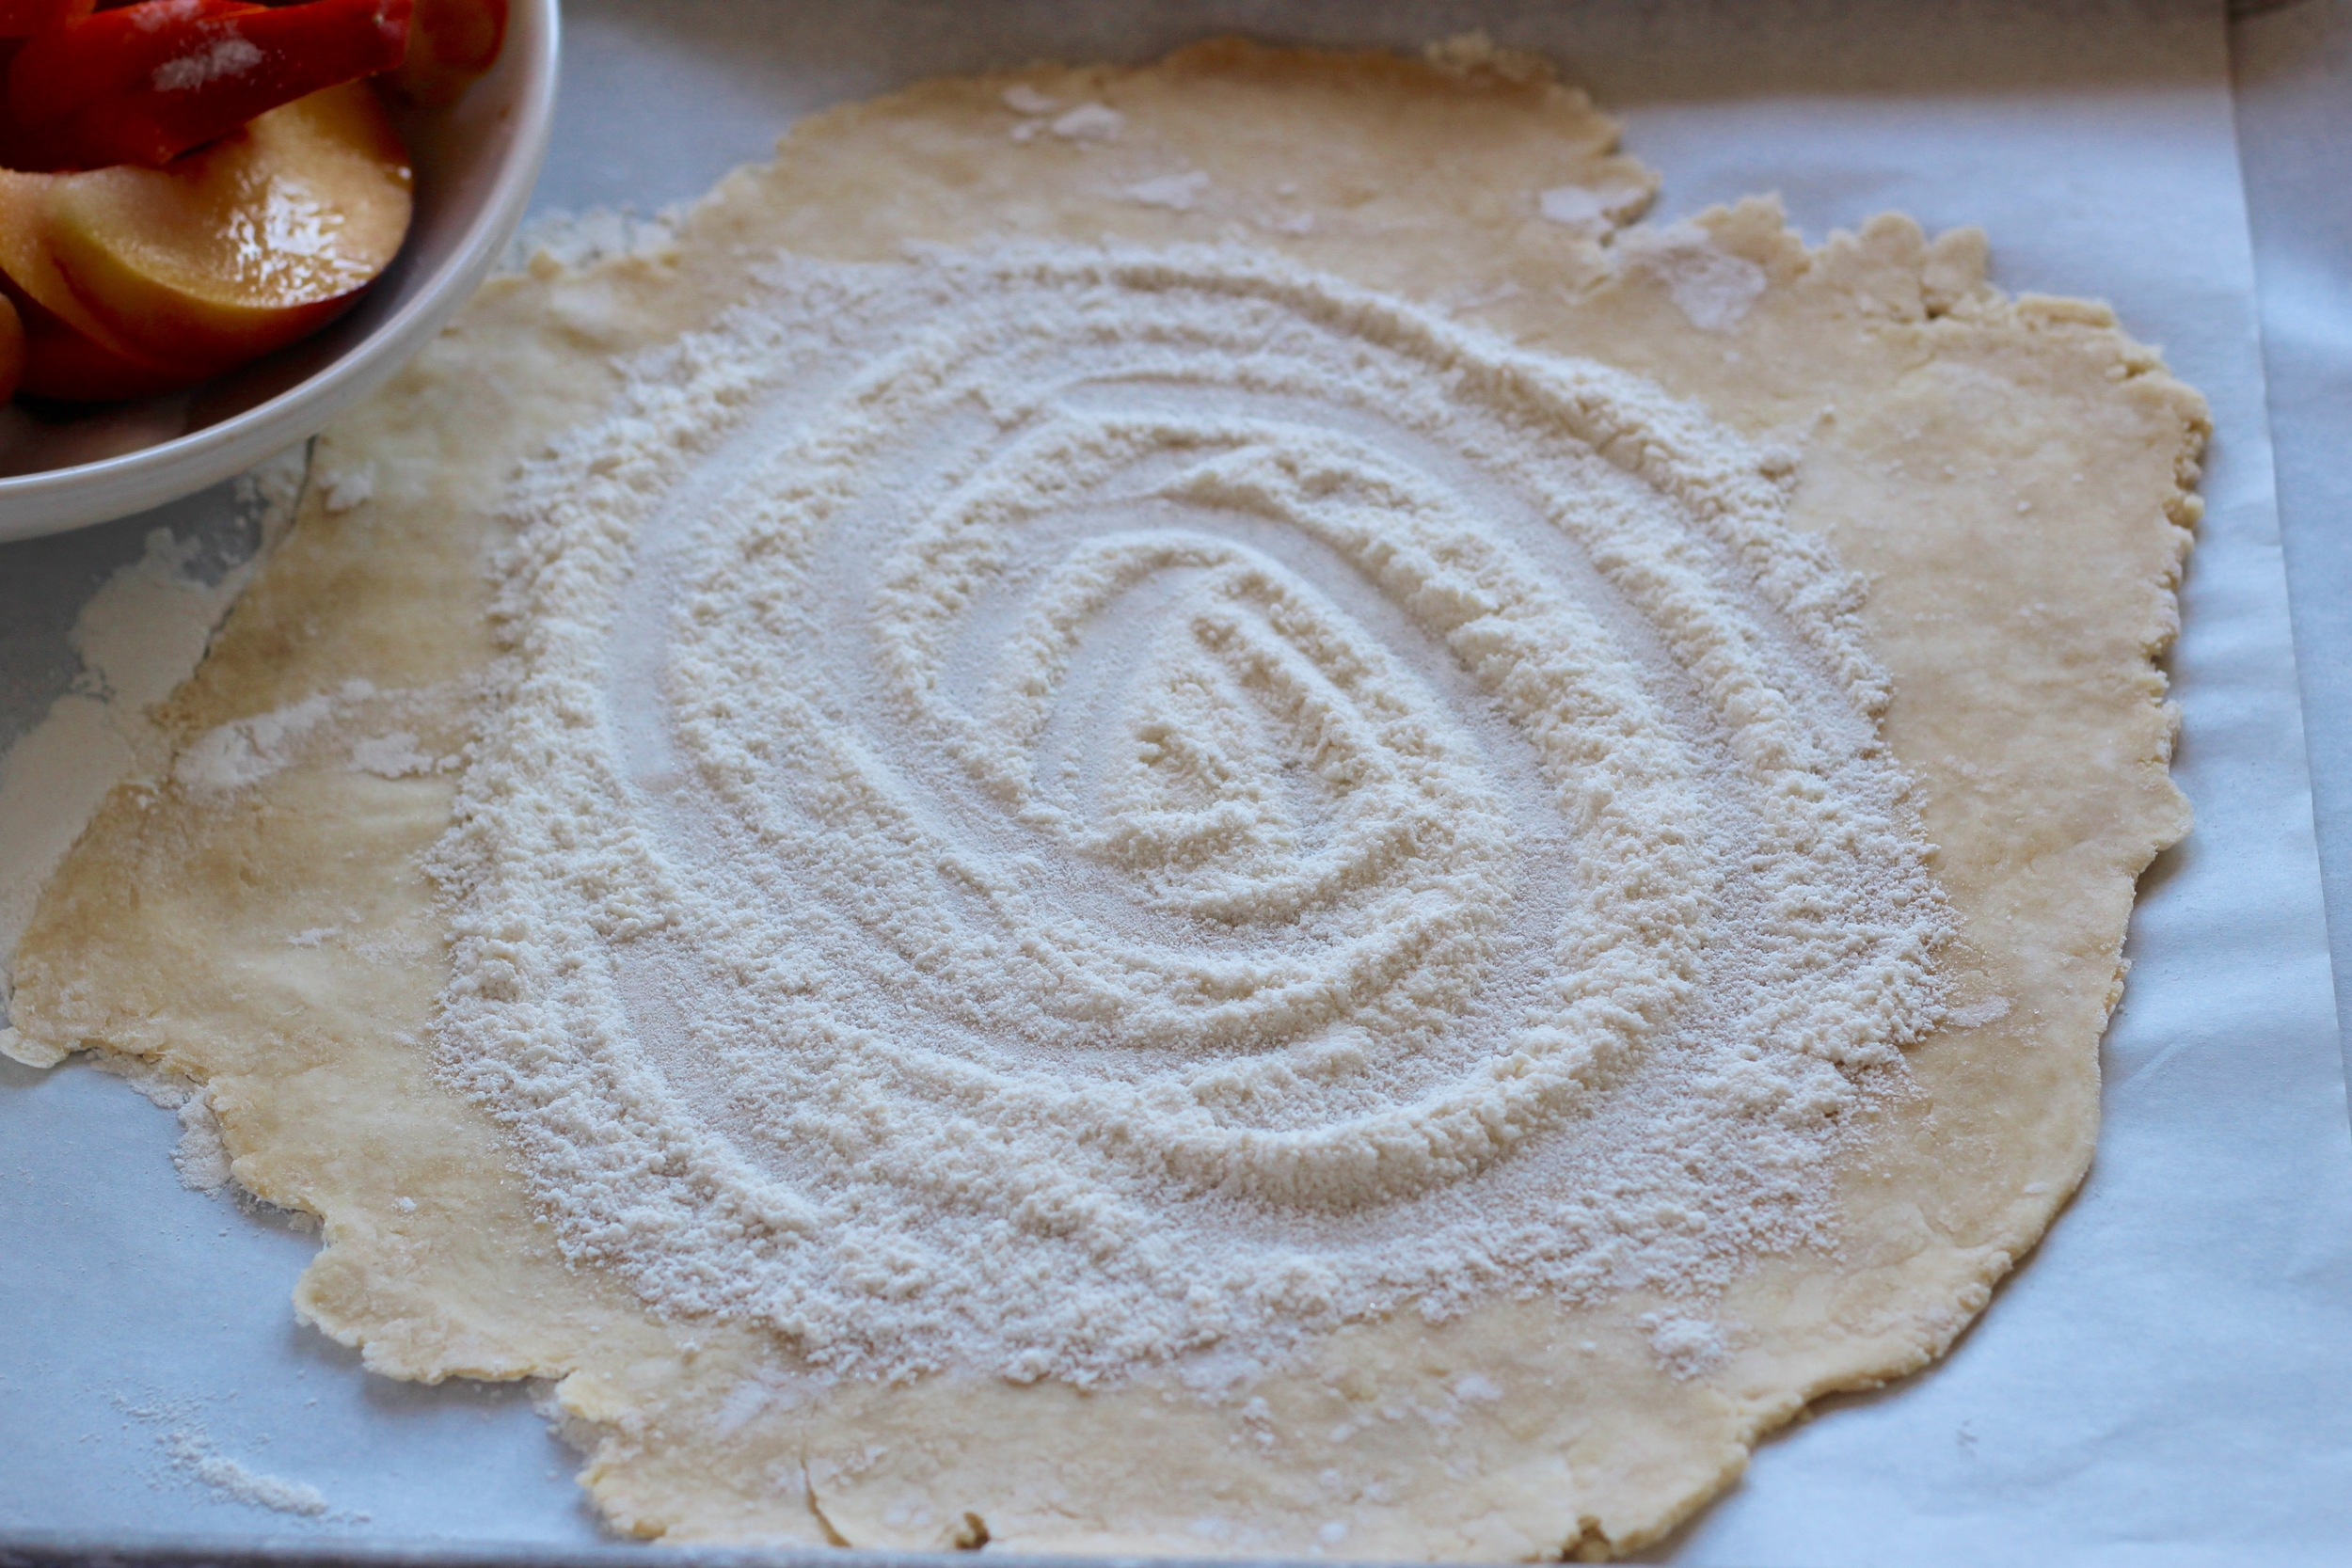 crostata dough with sugared flour on top | Recipe at ThreadandWhisk.com